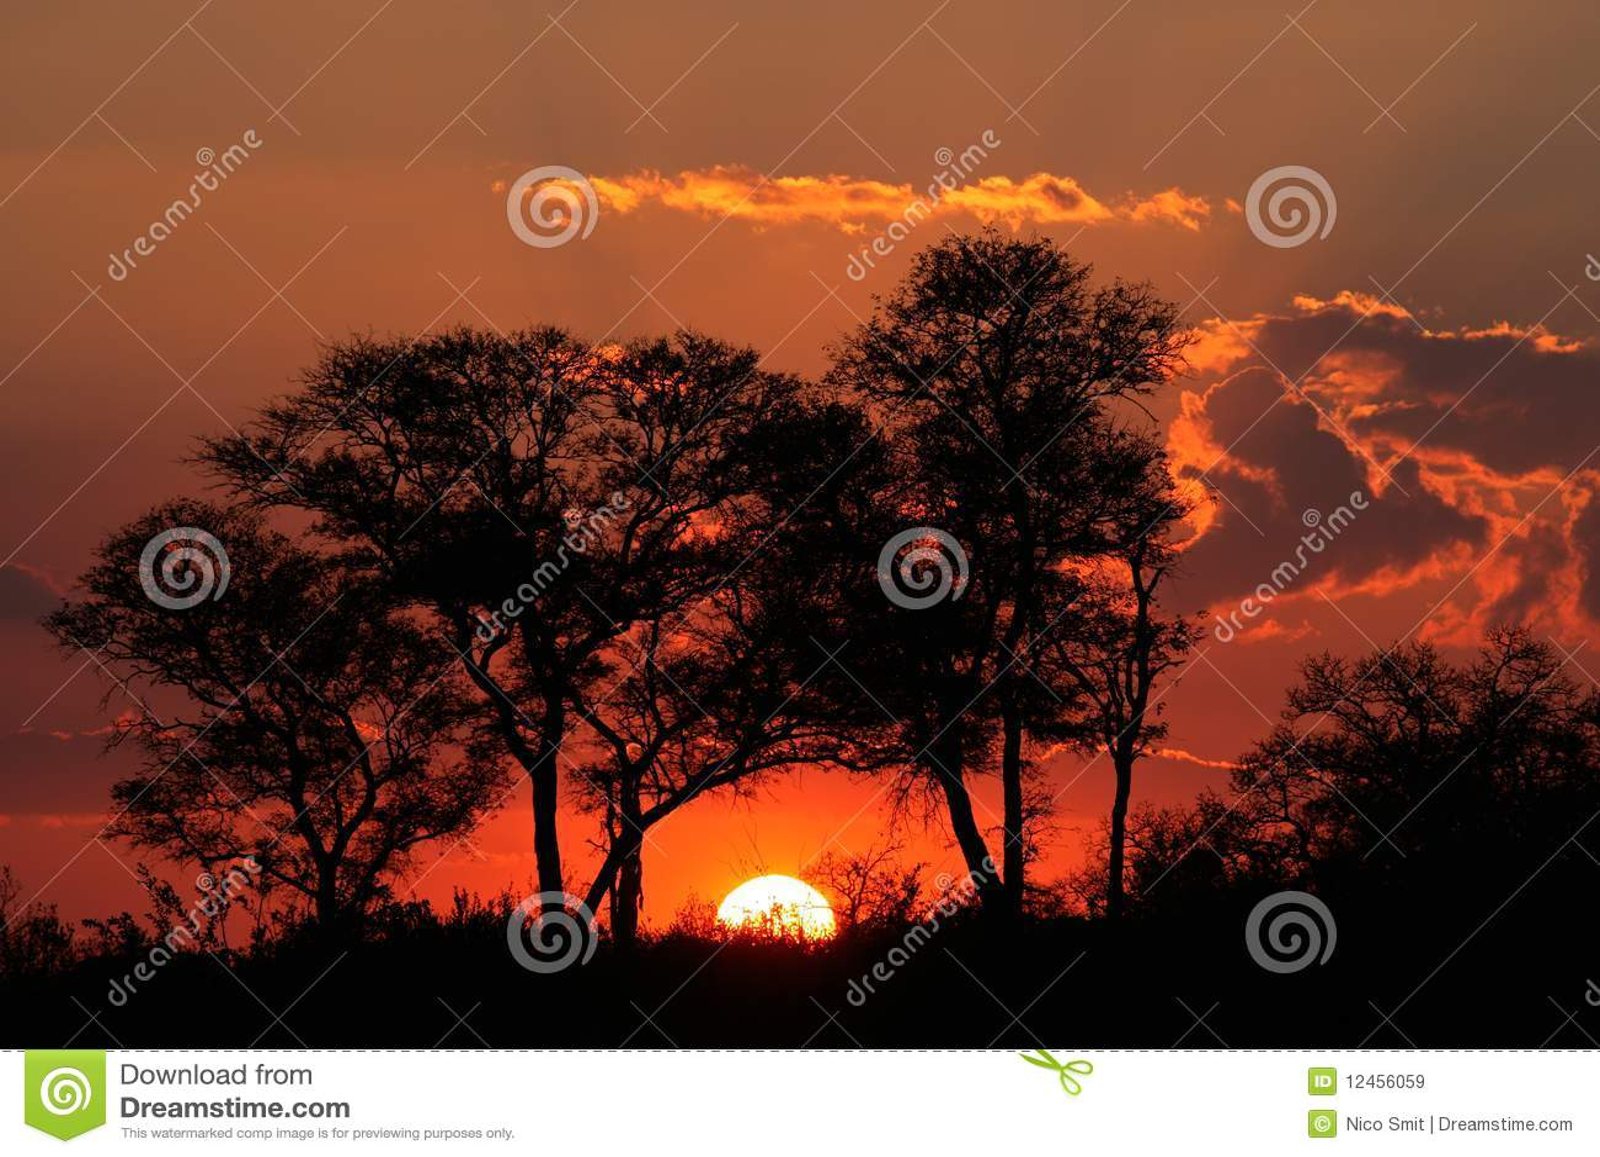 Savanna sunset, South Africa